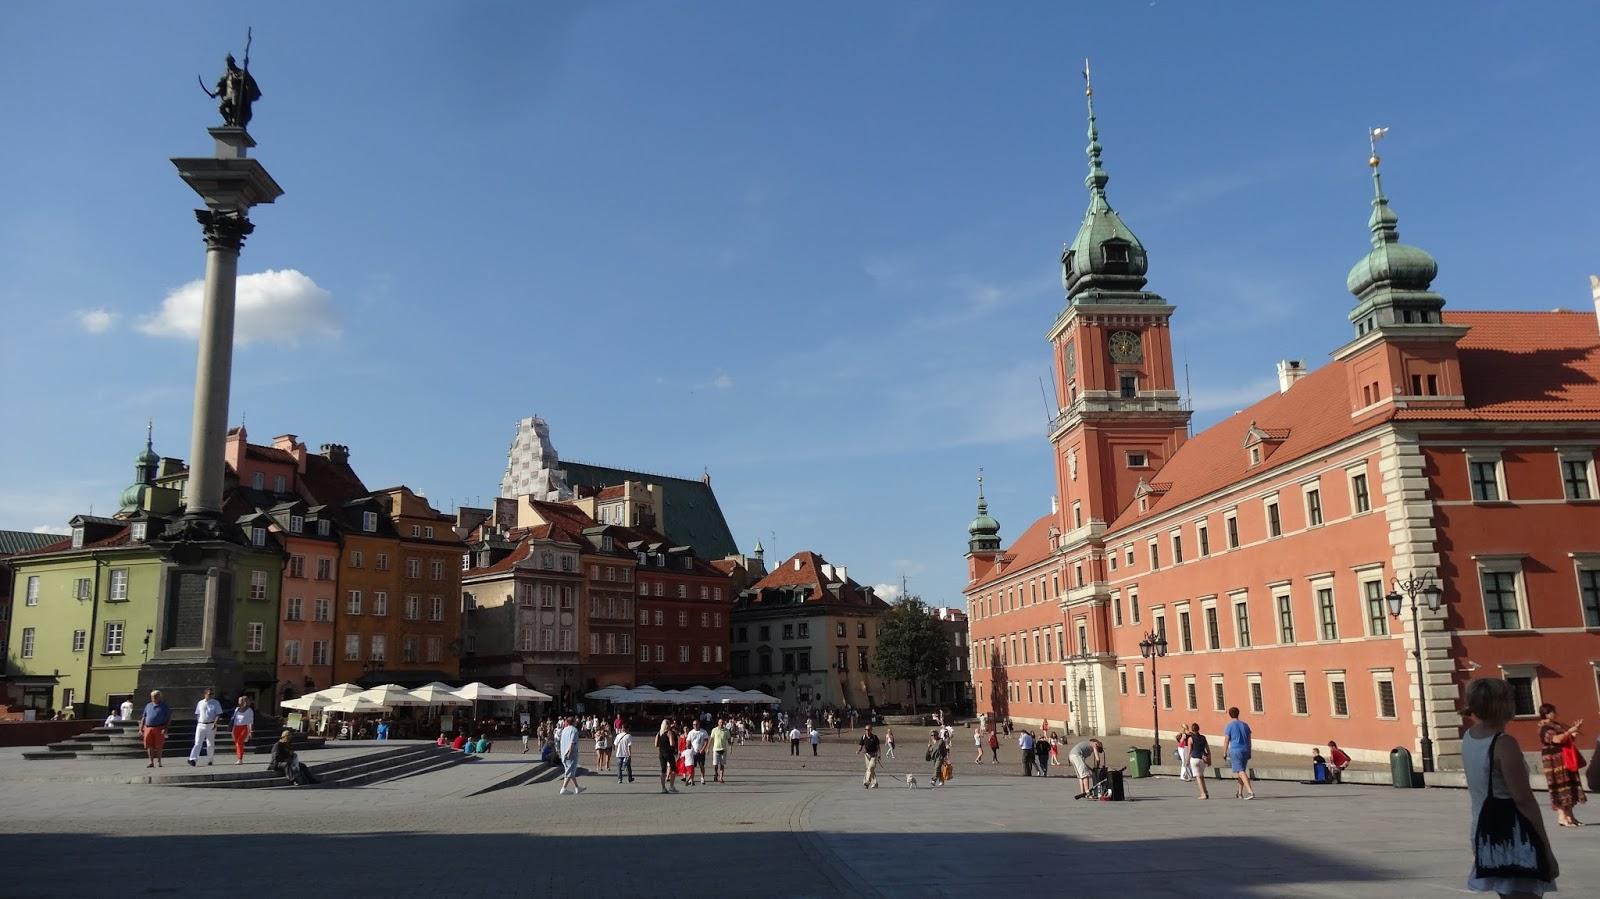 Tommy的波蘭部落格: 【華沙舊城與新世界大道】~波蘭中部旅遊景點